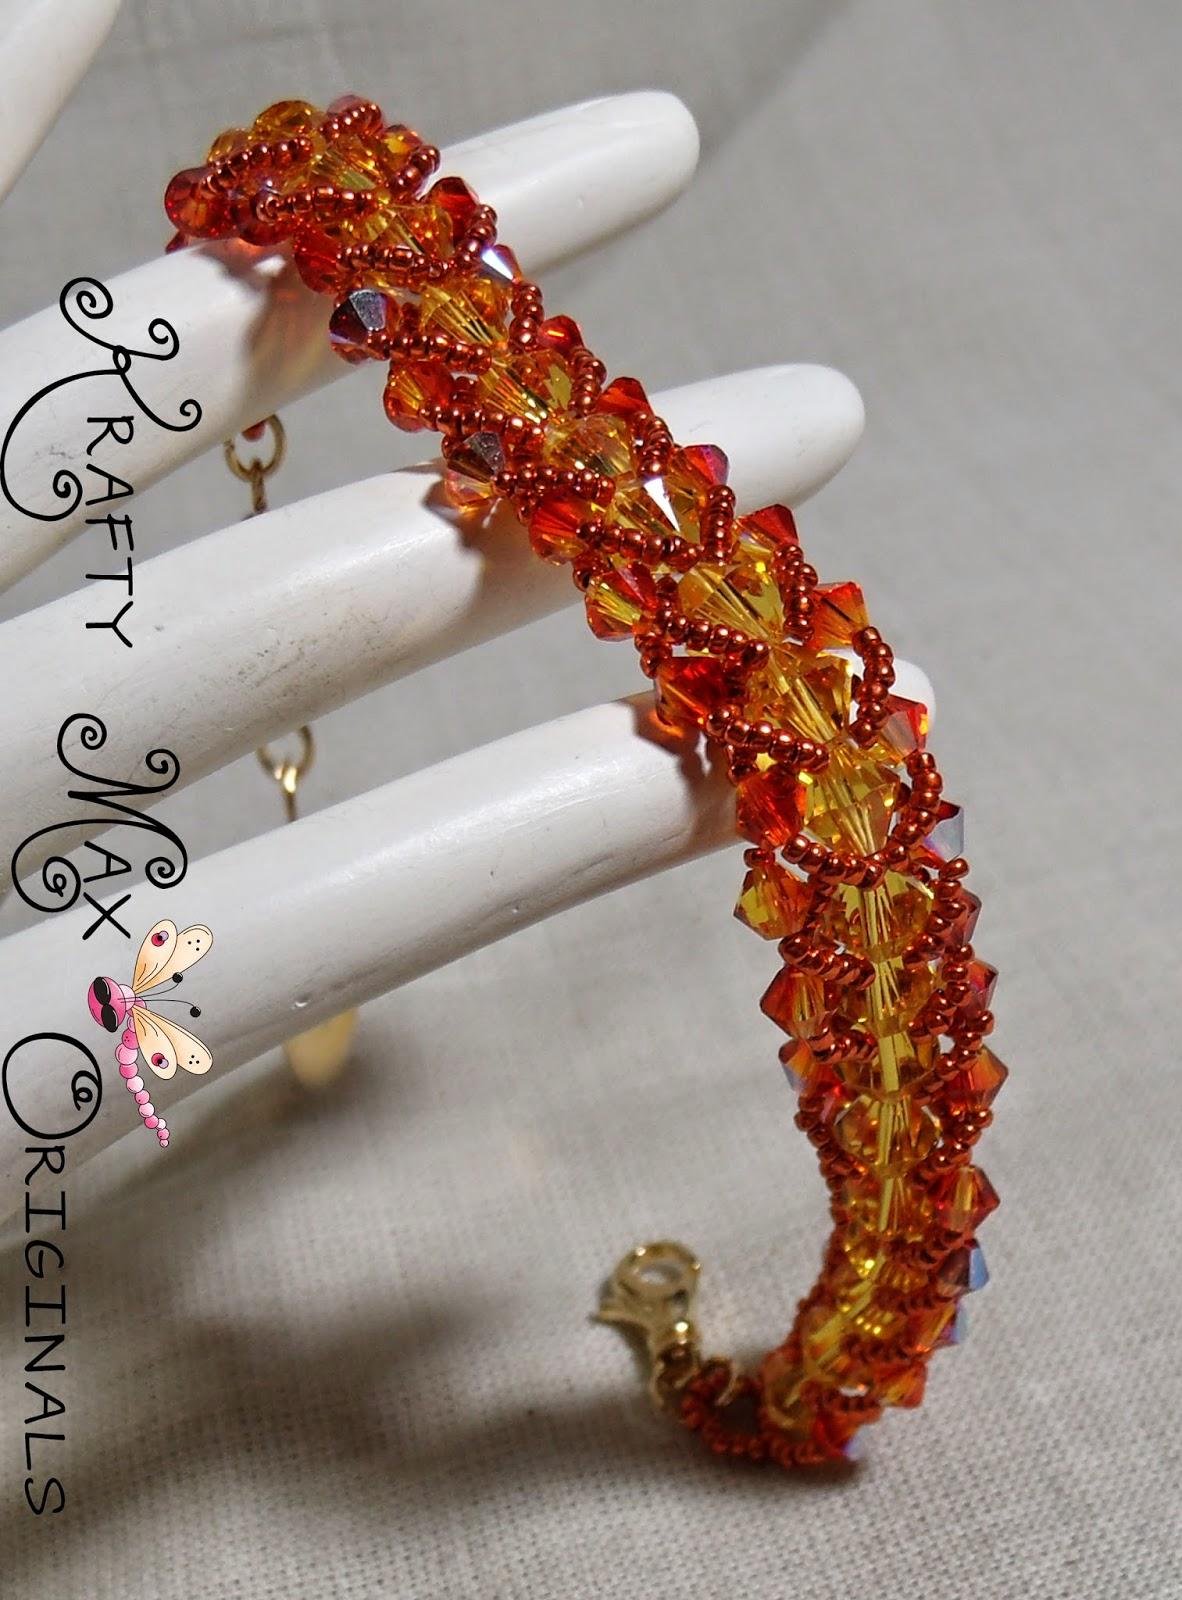 http://www.artfire.com/ext/shop/product_view/KraftyMax/9210813/swarovski_crystal_on_fire_handmade_beadwoven_bracelet/handmade/jewelry/bracelets/beadwork